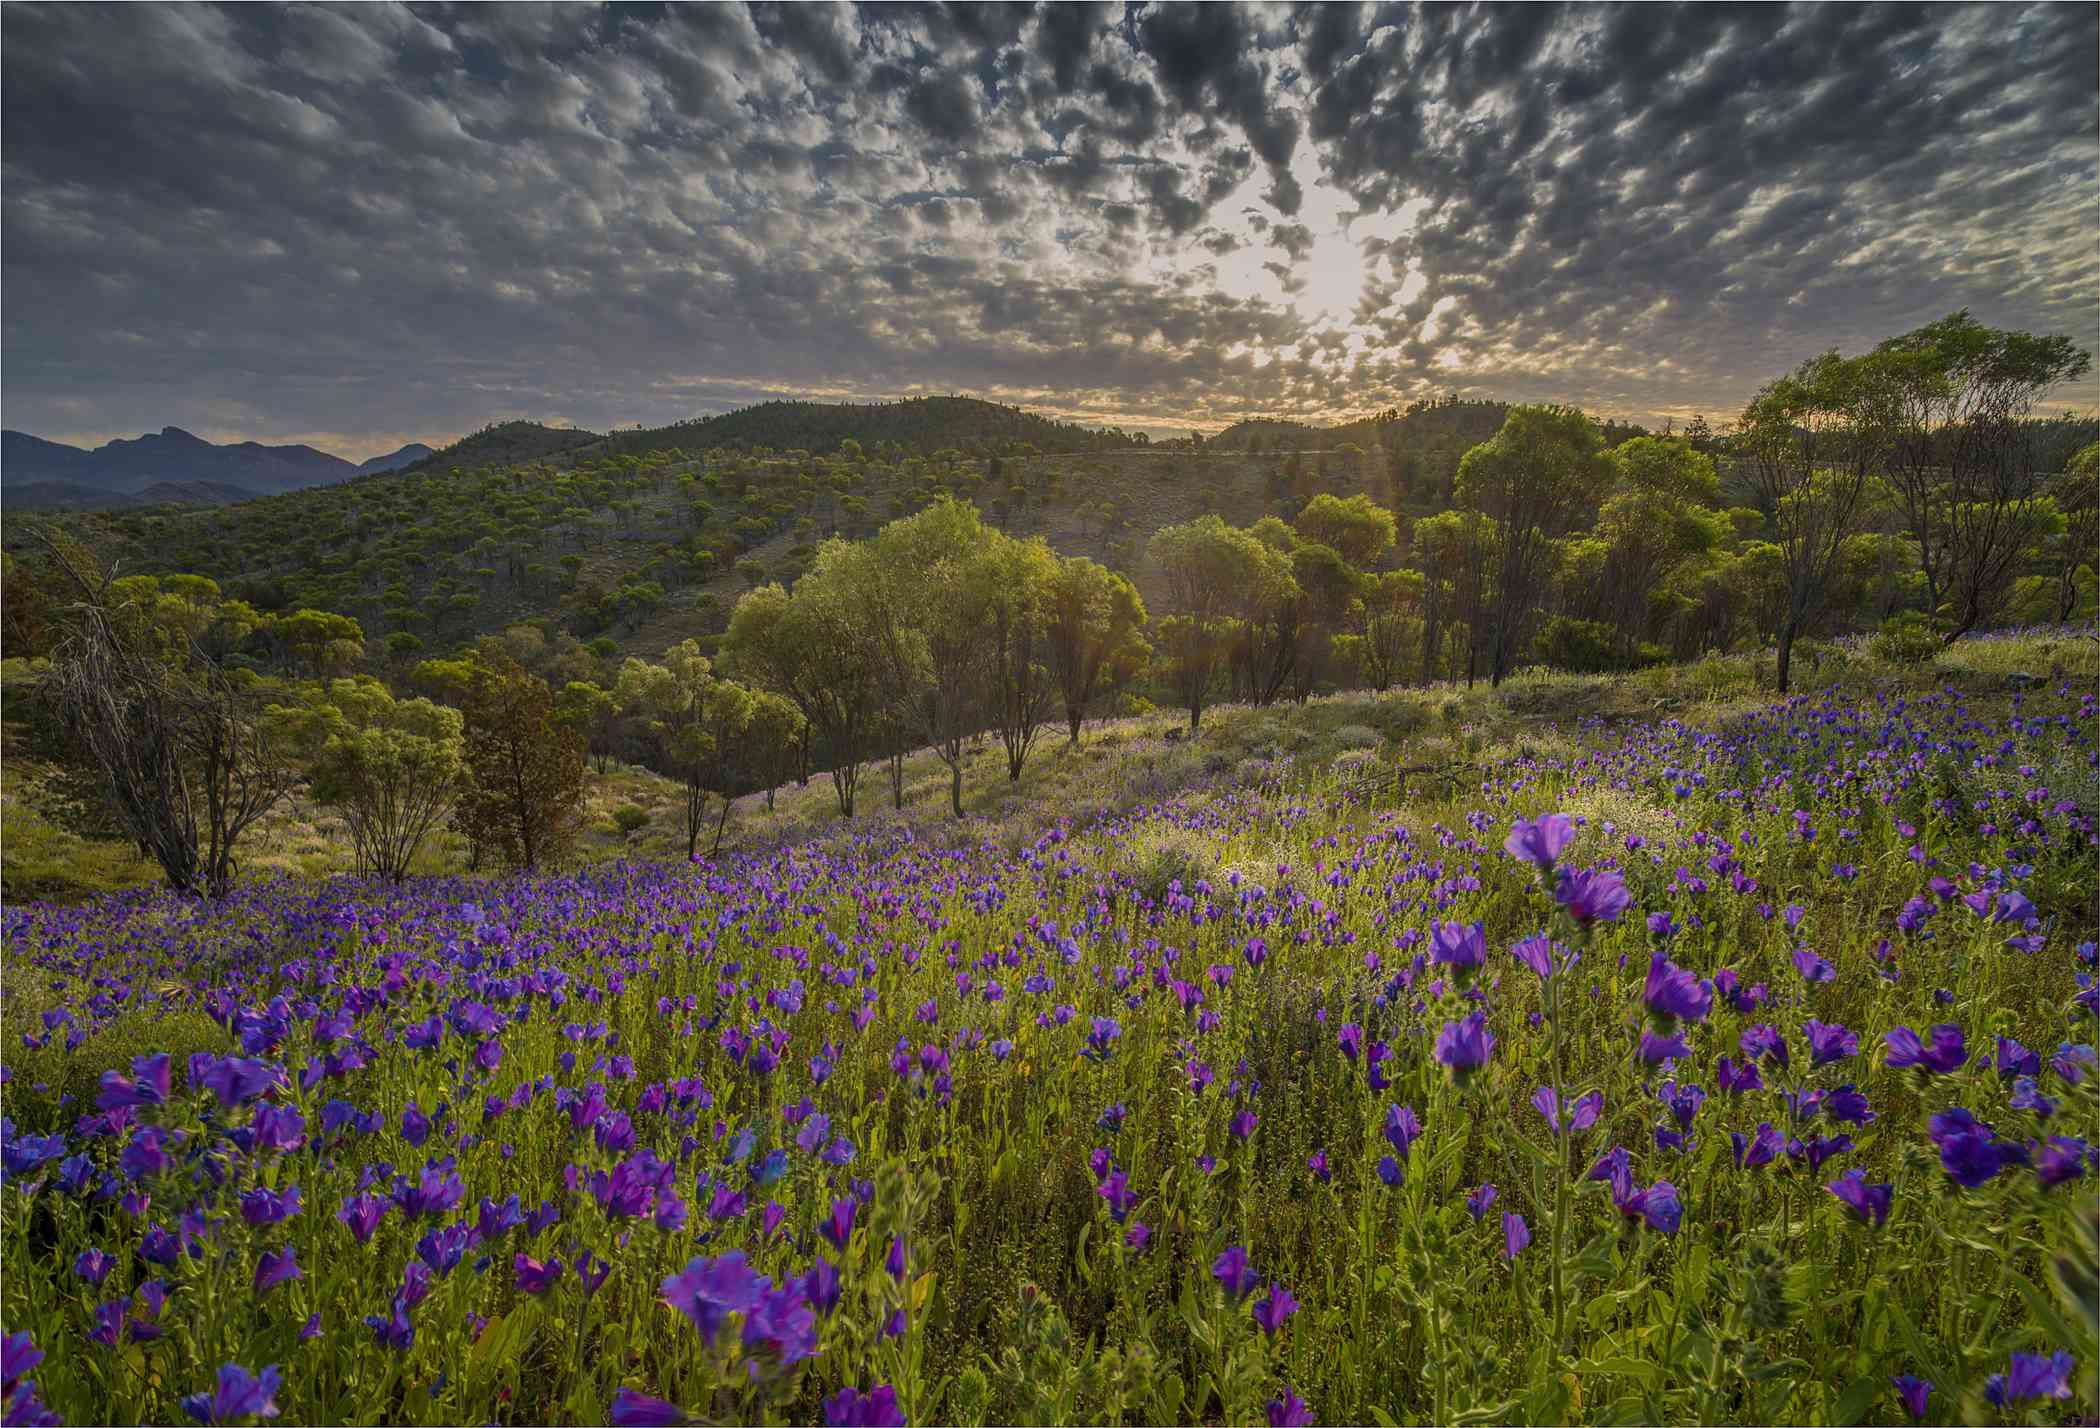 Wildflowers in Australia